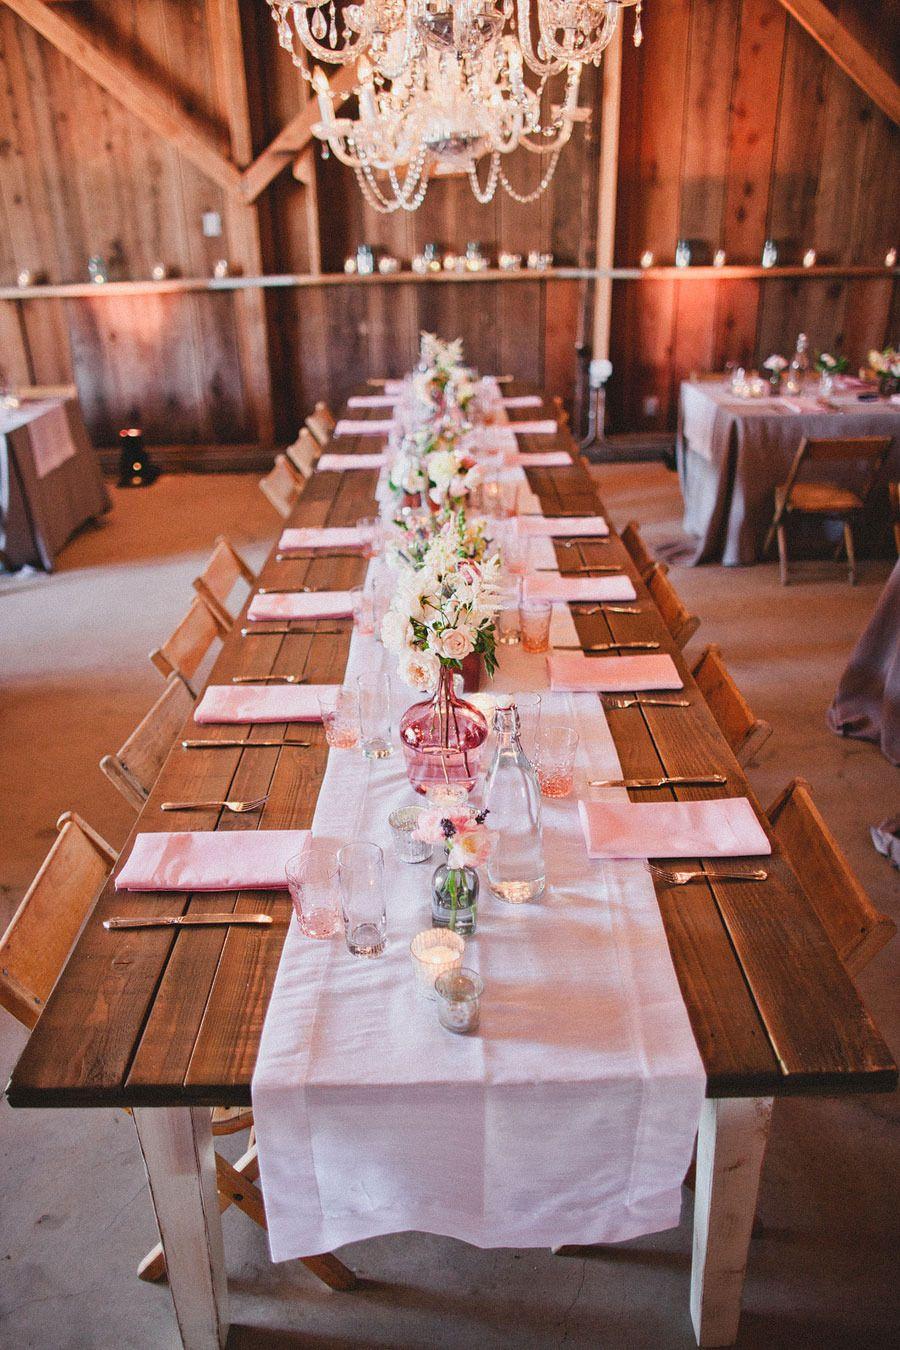 #rustic, #tablescapes, #table-runners, #chandelier  Photography: Mark Brooke Photography - markbrooke.com Planning + Design: Joy de Vivre Wedding Coordination - joydevivre.net Floral Design: NLC Productions - nicosb.com  Read More: http://www.stylemepretty.com/2013/04/10/solvang-wedding-from-joy-de-vivre-event-design-boutique/